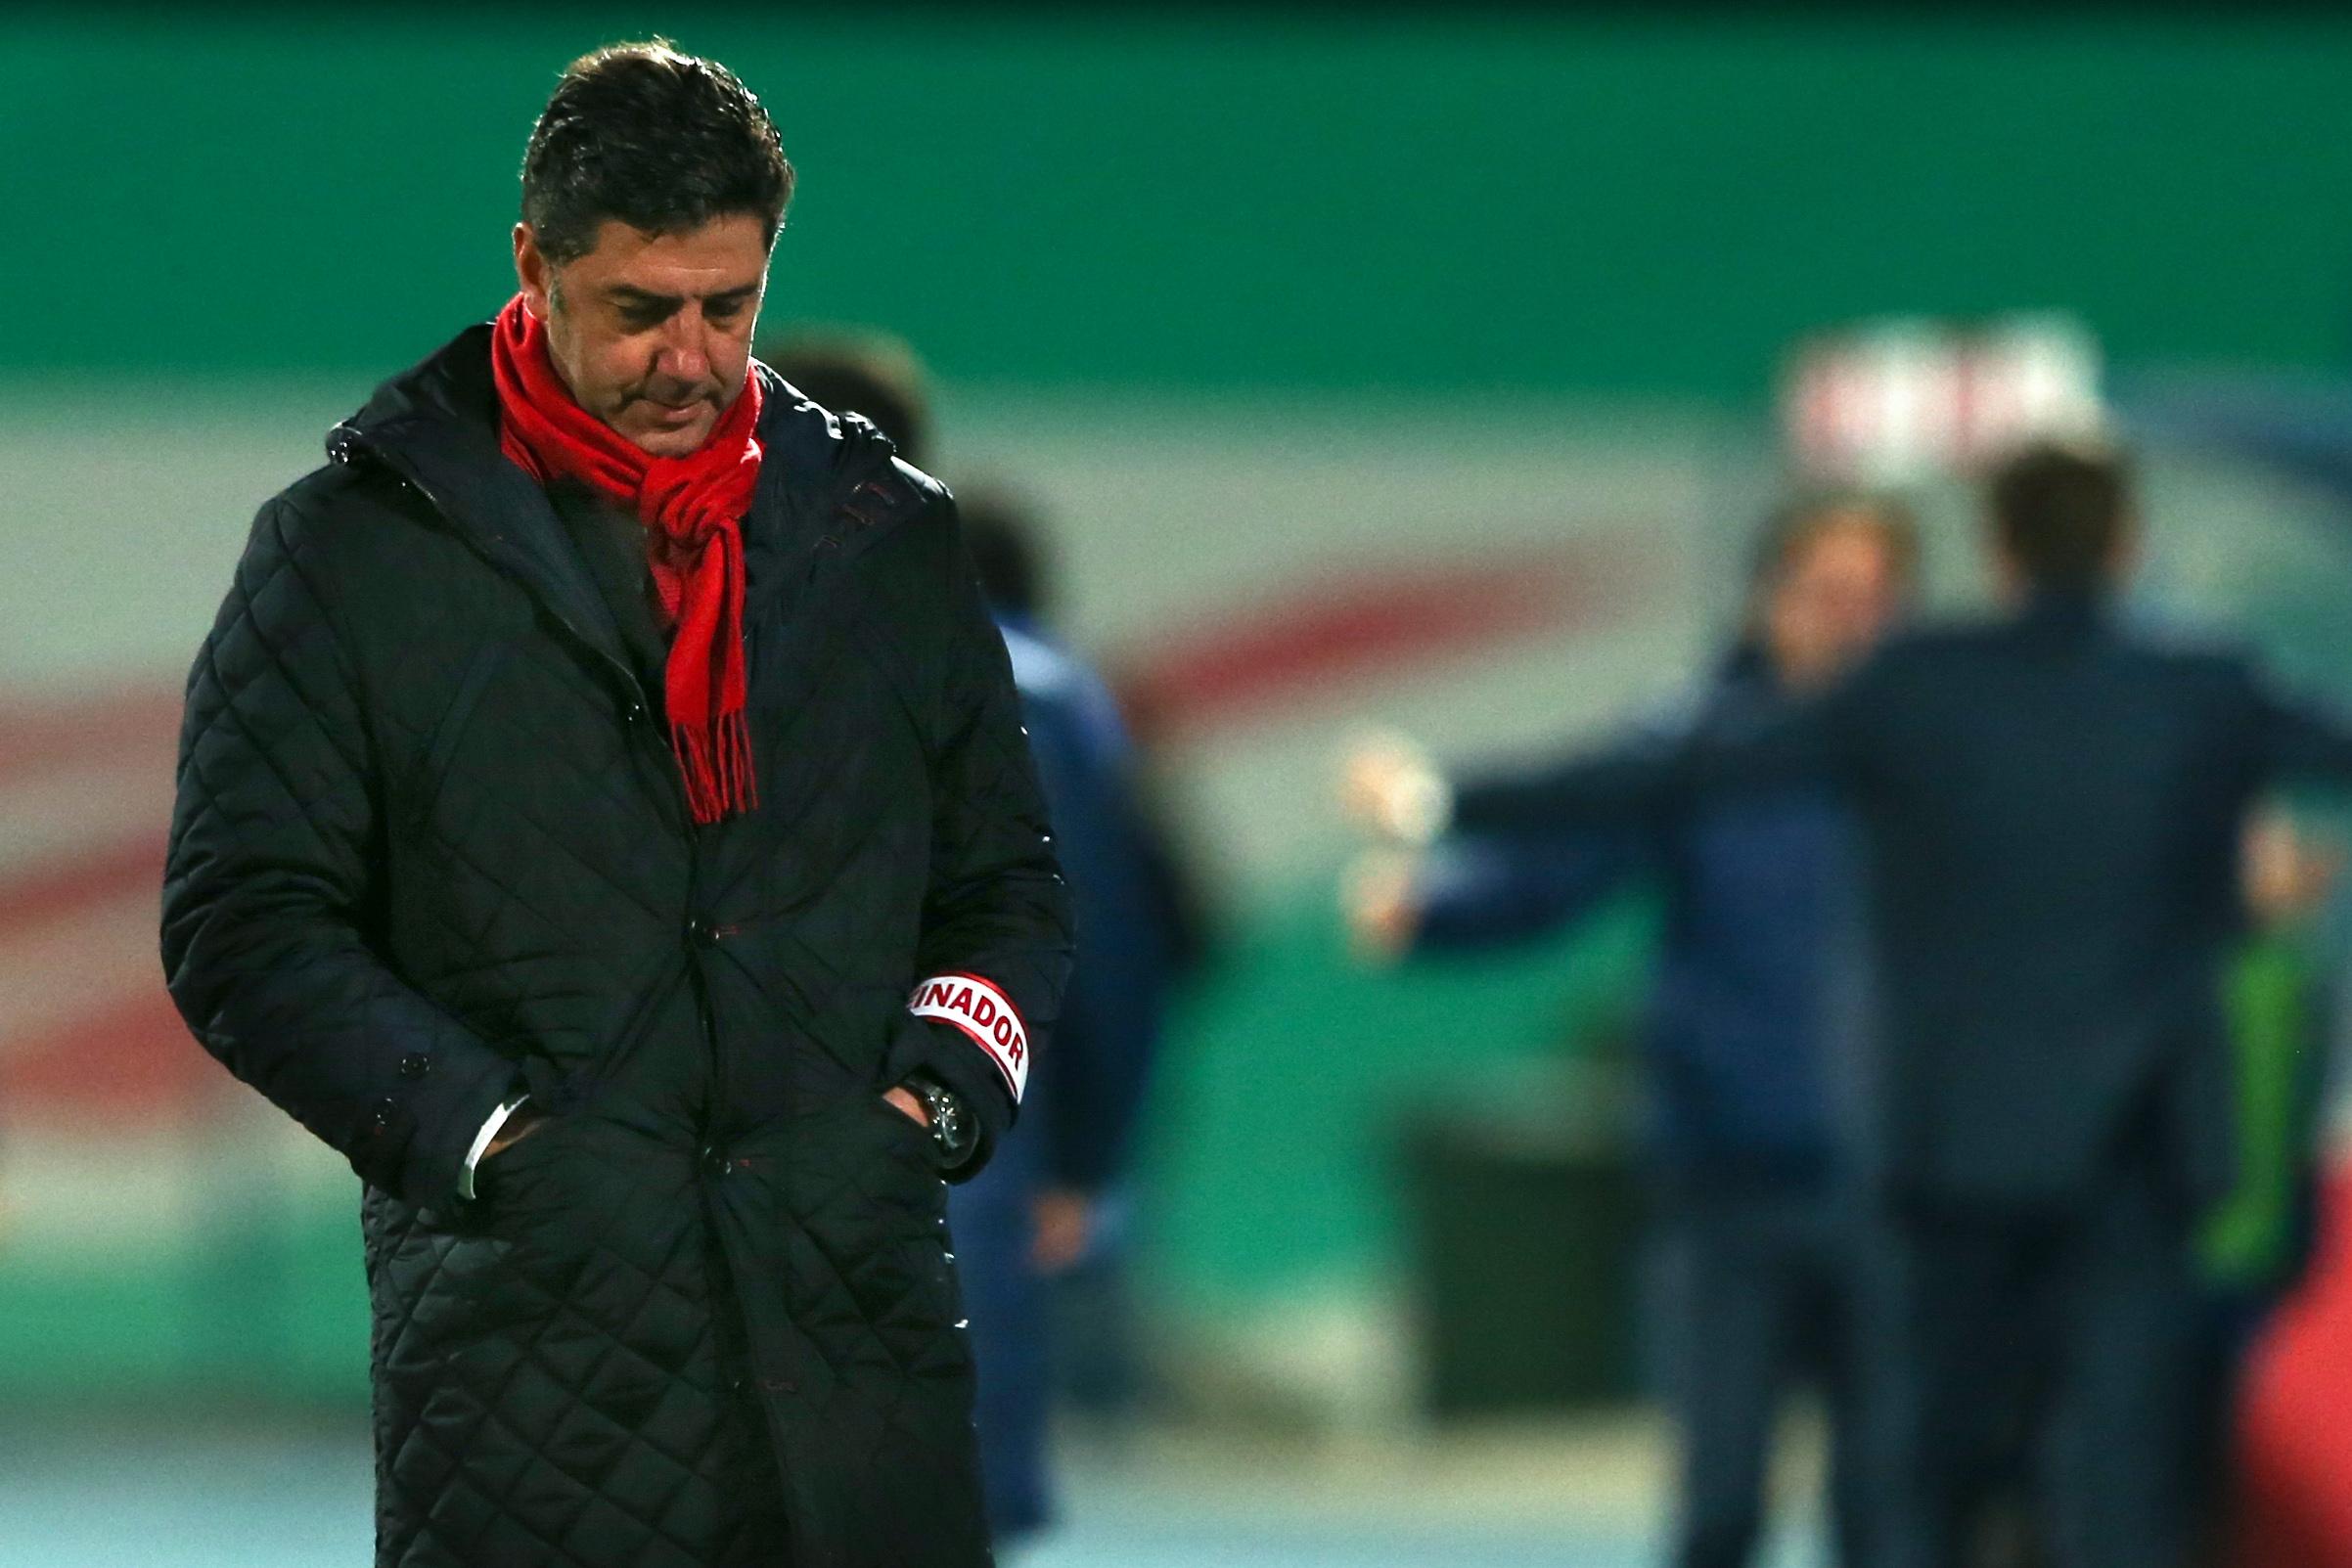 Análise ao Belenenses 1-1 Benfica da Primeira Liga — Joga Simples